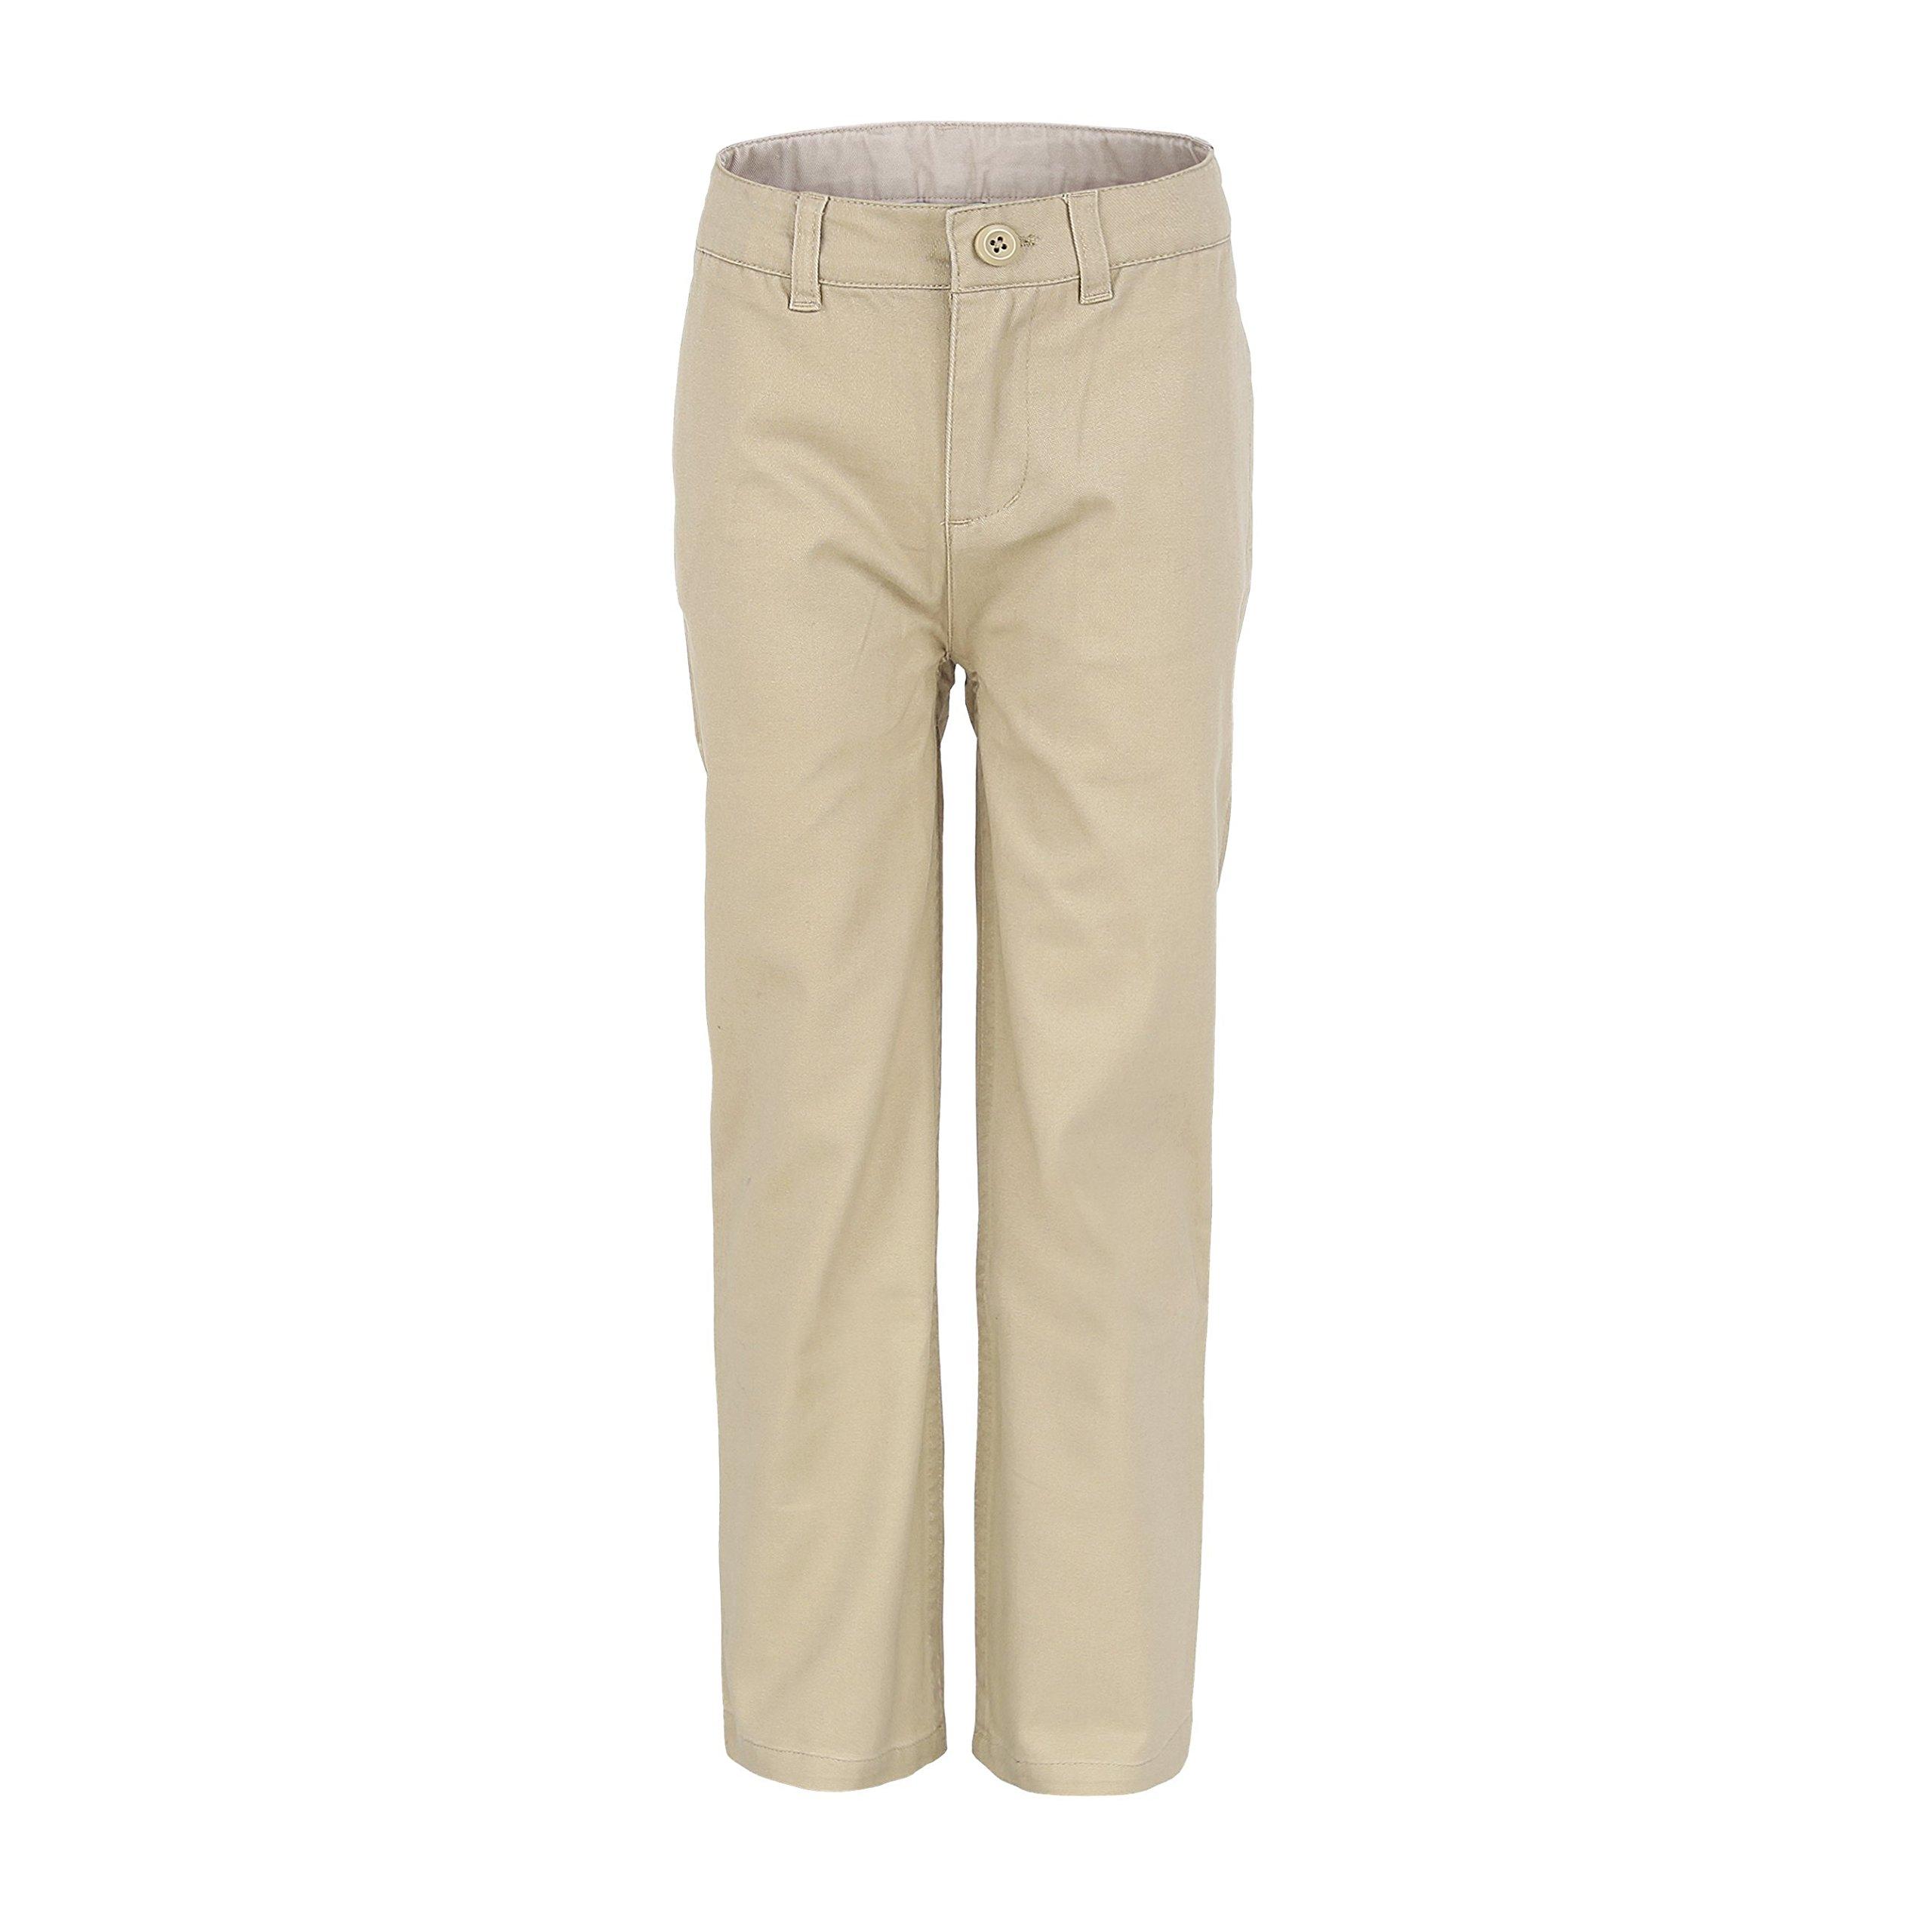 Bienzoe Big Boy's School Uniforms Flat Front Adjust Waist Pants Khaki Size 10